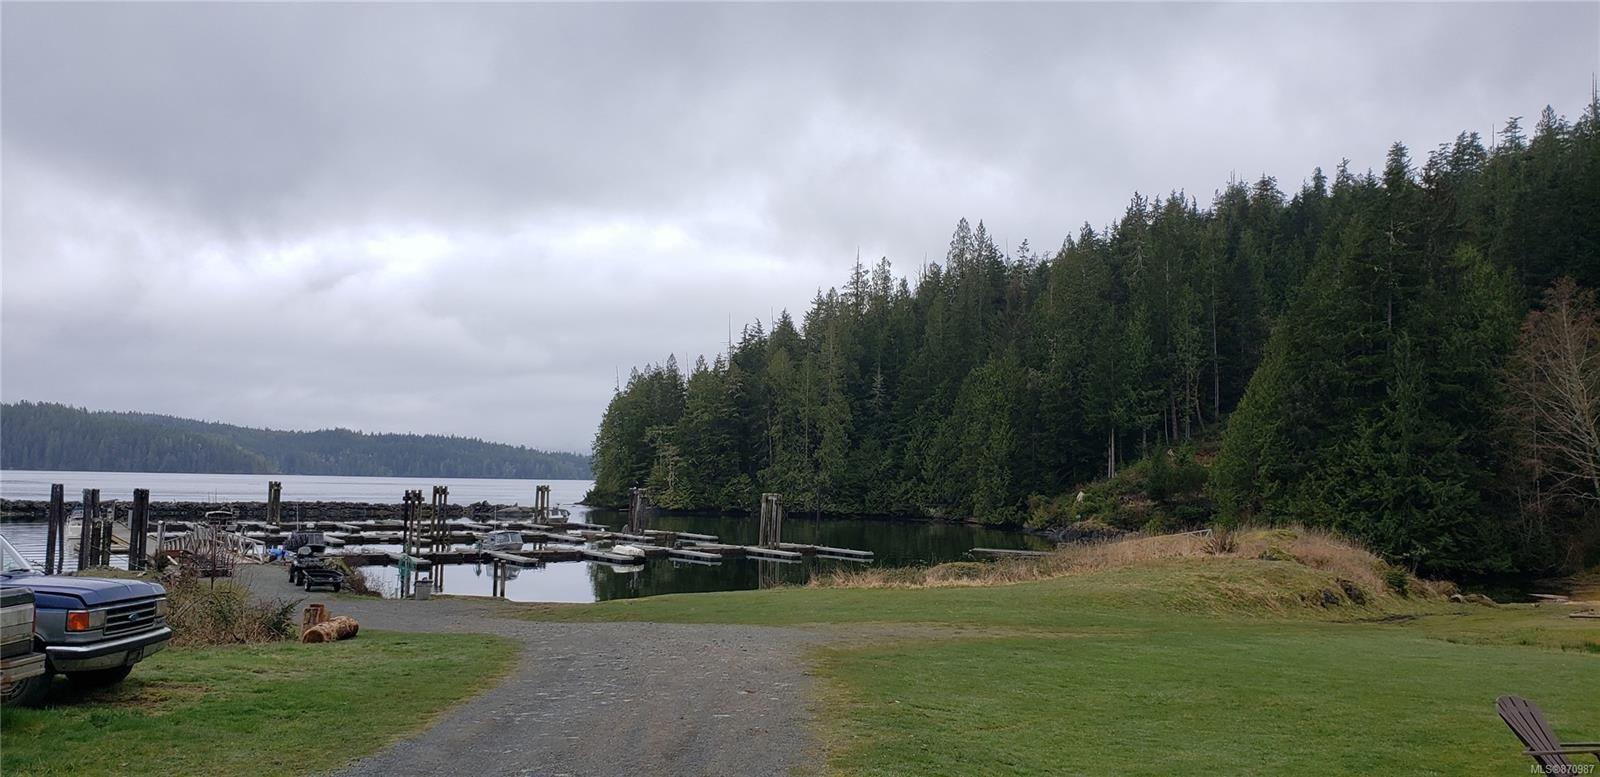 Main Photo: Lot 16 Haggard Cove in : PA Alberni Inlet Land for sale (Port Alberni)  : MLS®# 870987